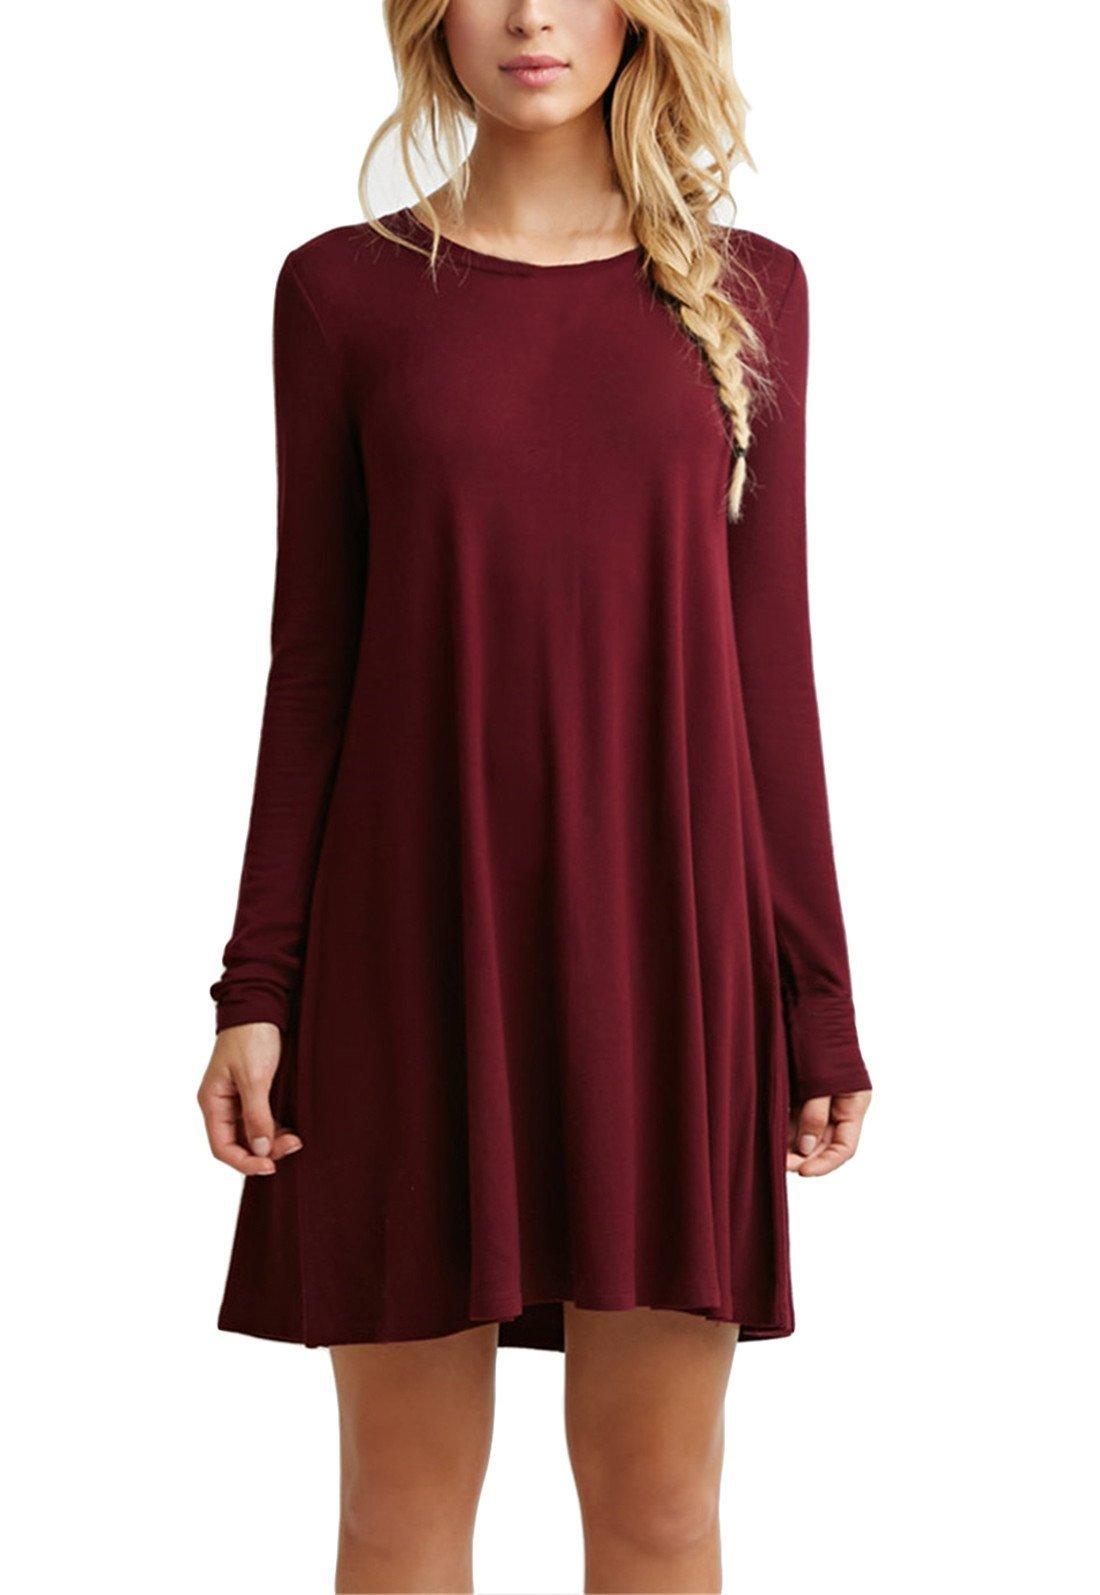 Casual Burgundy Dress Amazon Com